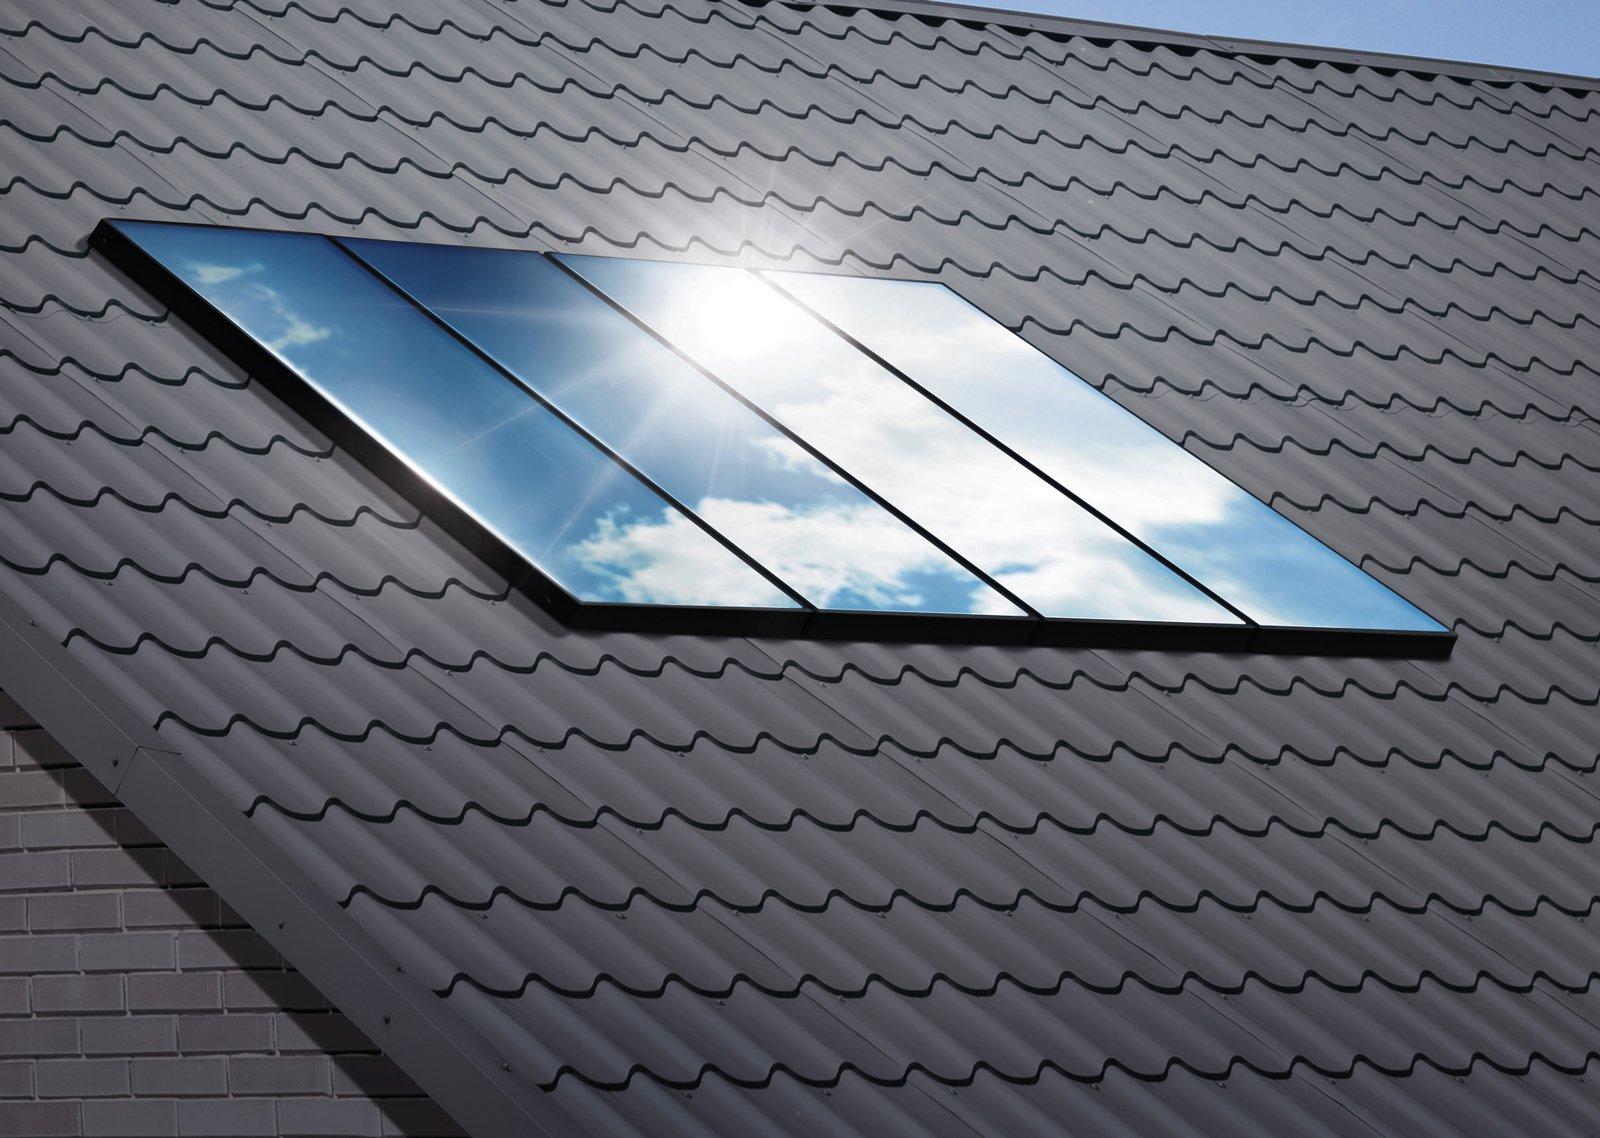 Pannello Solare Termico Viessmann : Impianto solare termico viessmann un investimento che si